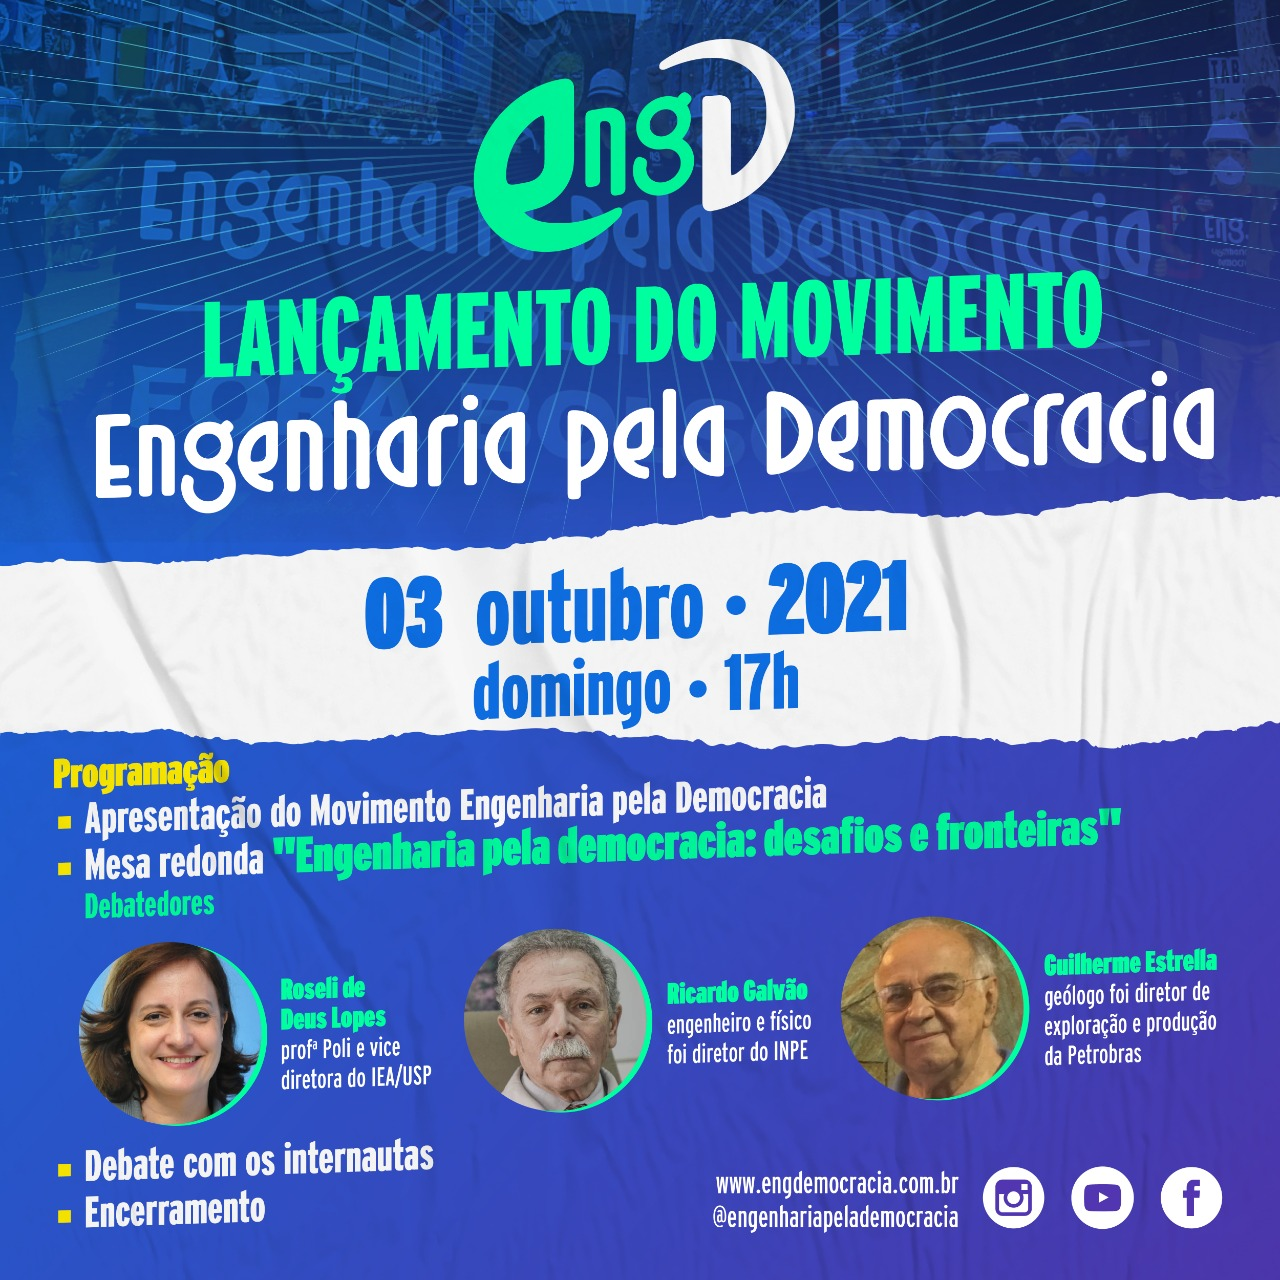 Manifesto Engenharia pela Democracia